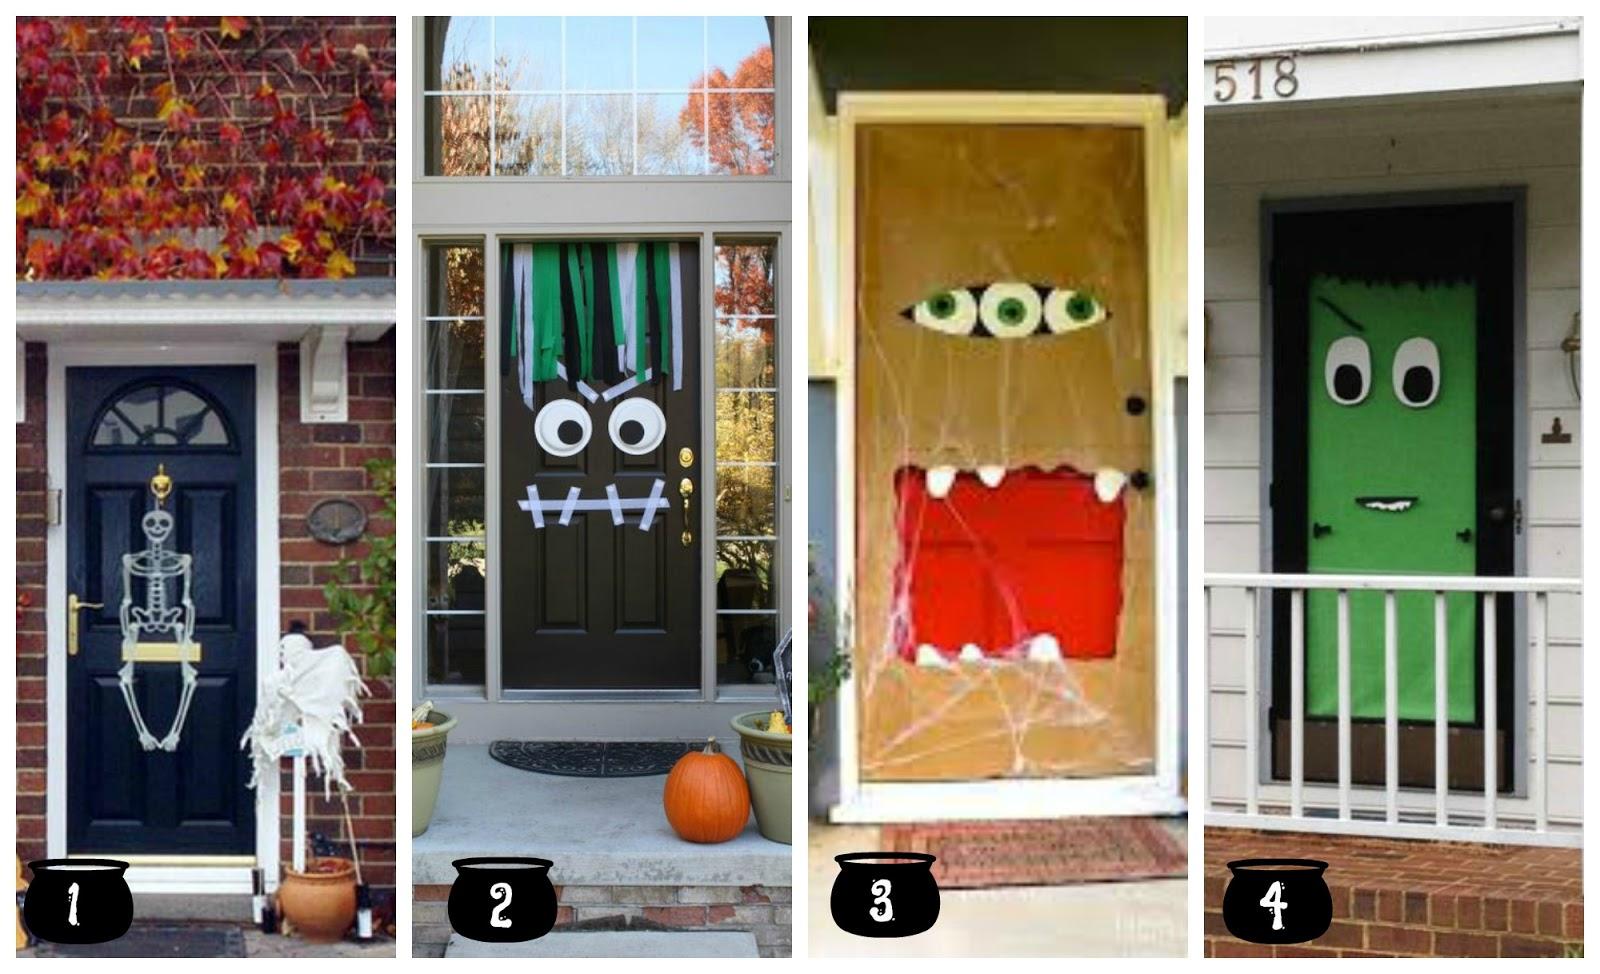 Ideas para decorar puertas para ideas para decorar for Imagenes puertas decoradas halloween